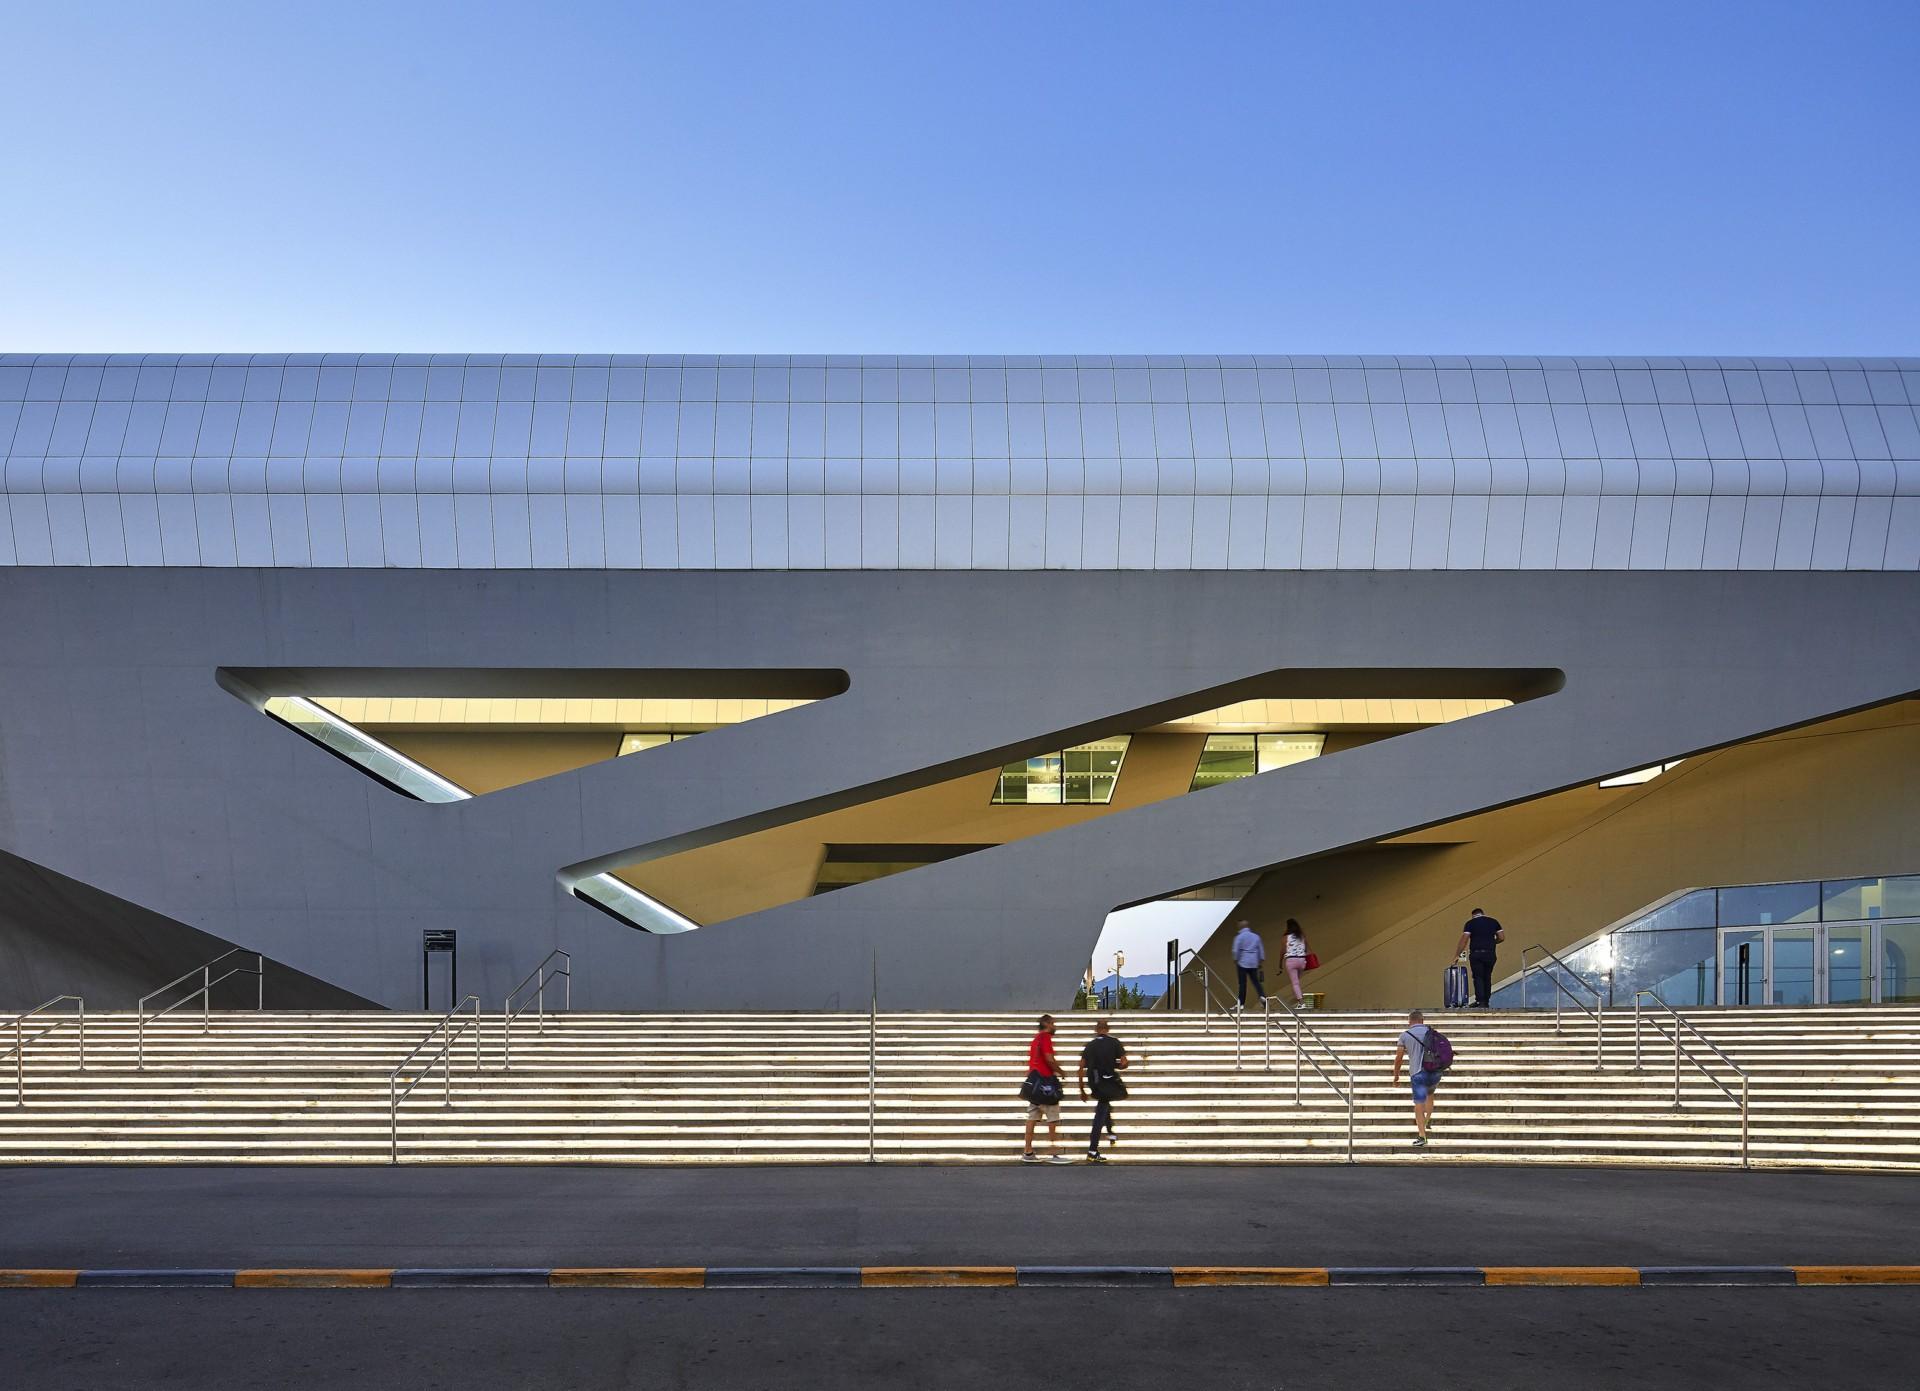 Zaha Hadid Architects Napoli-Afragola High Speed Train Station